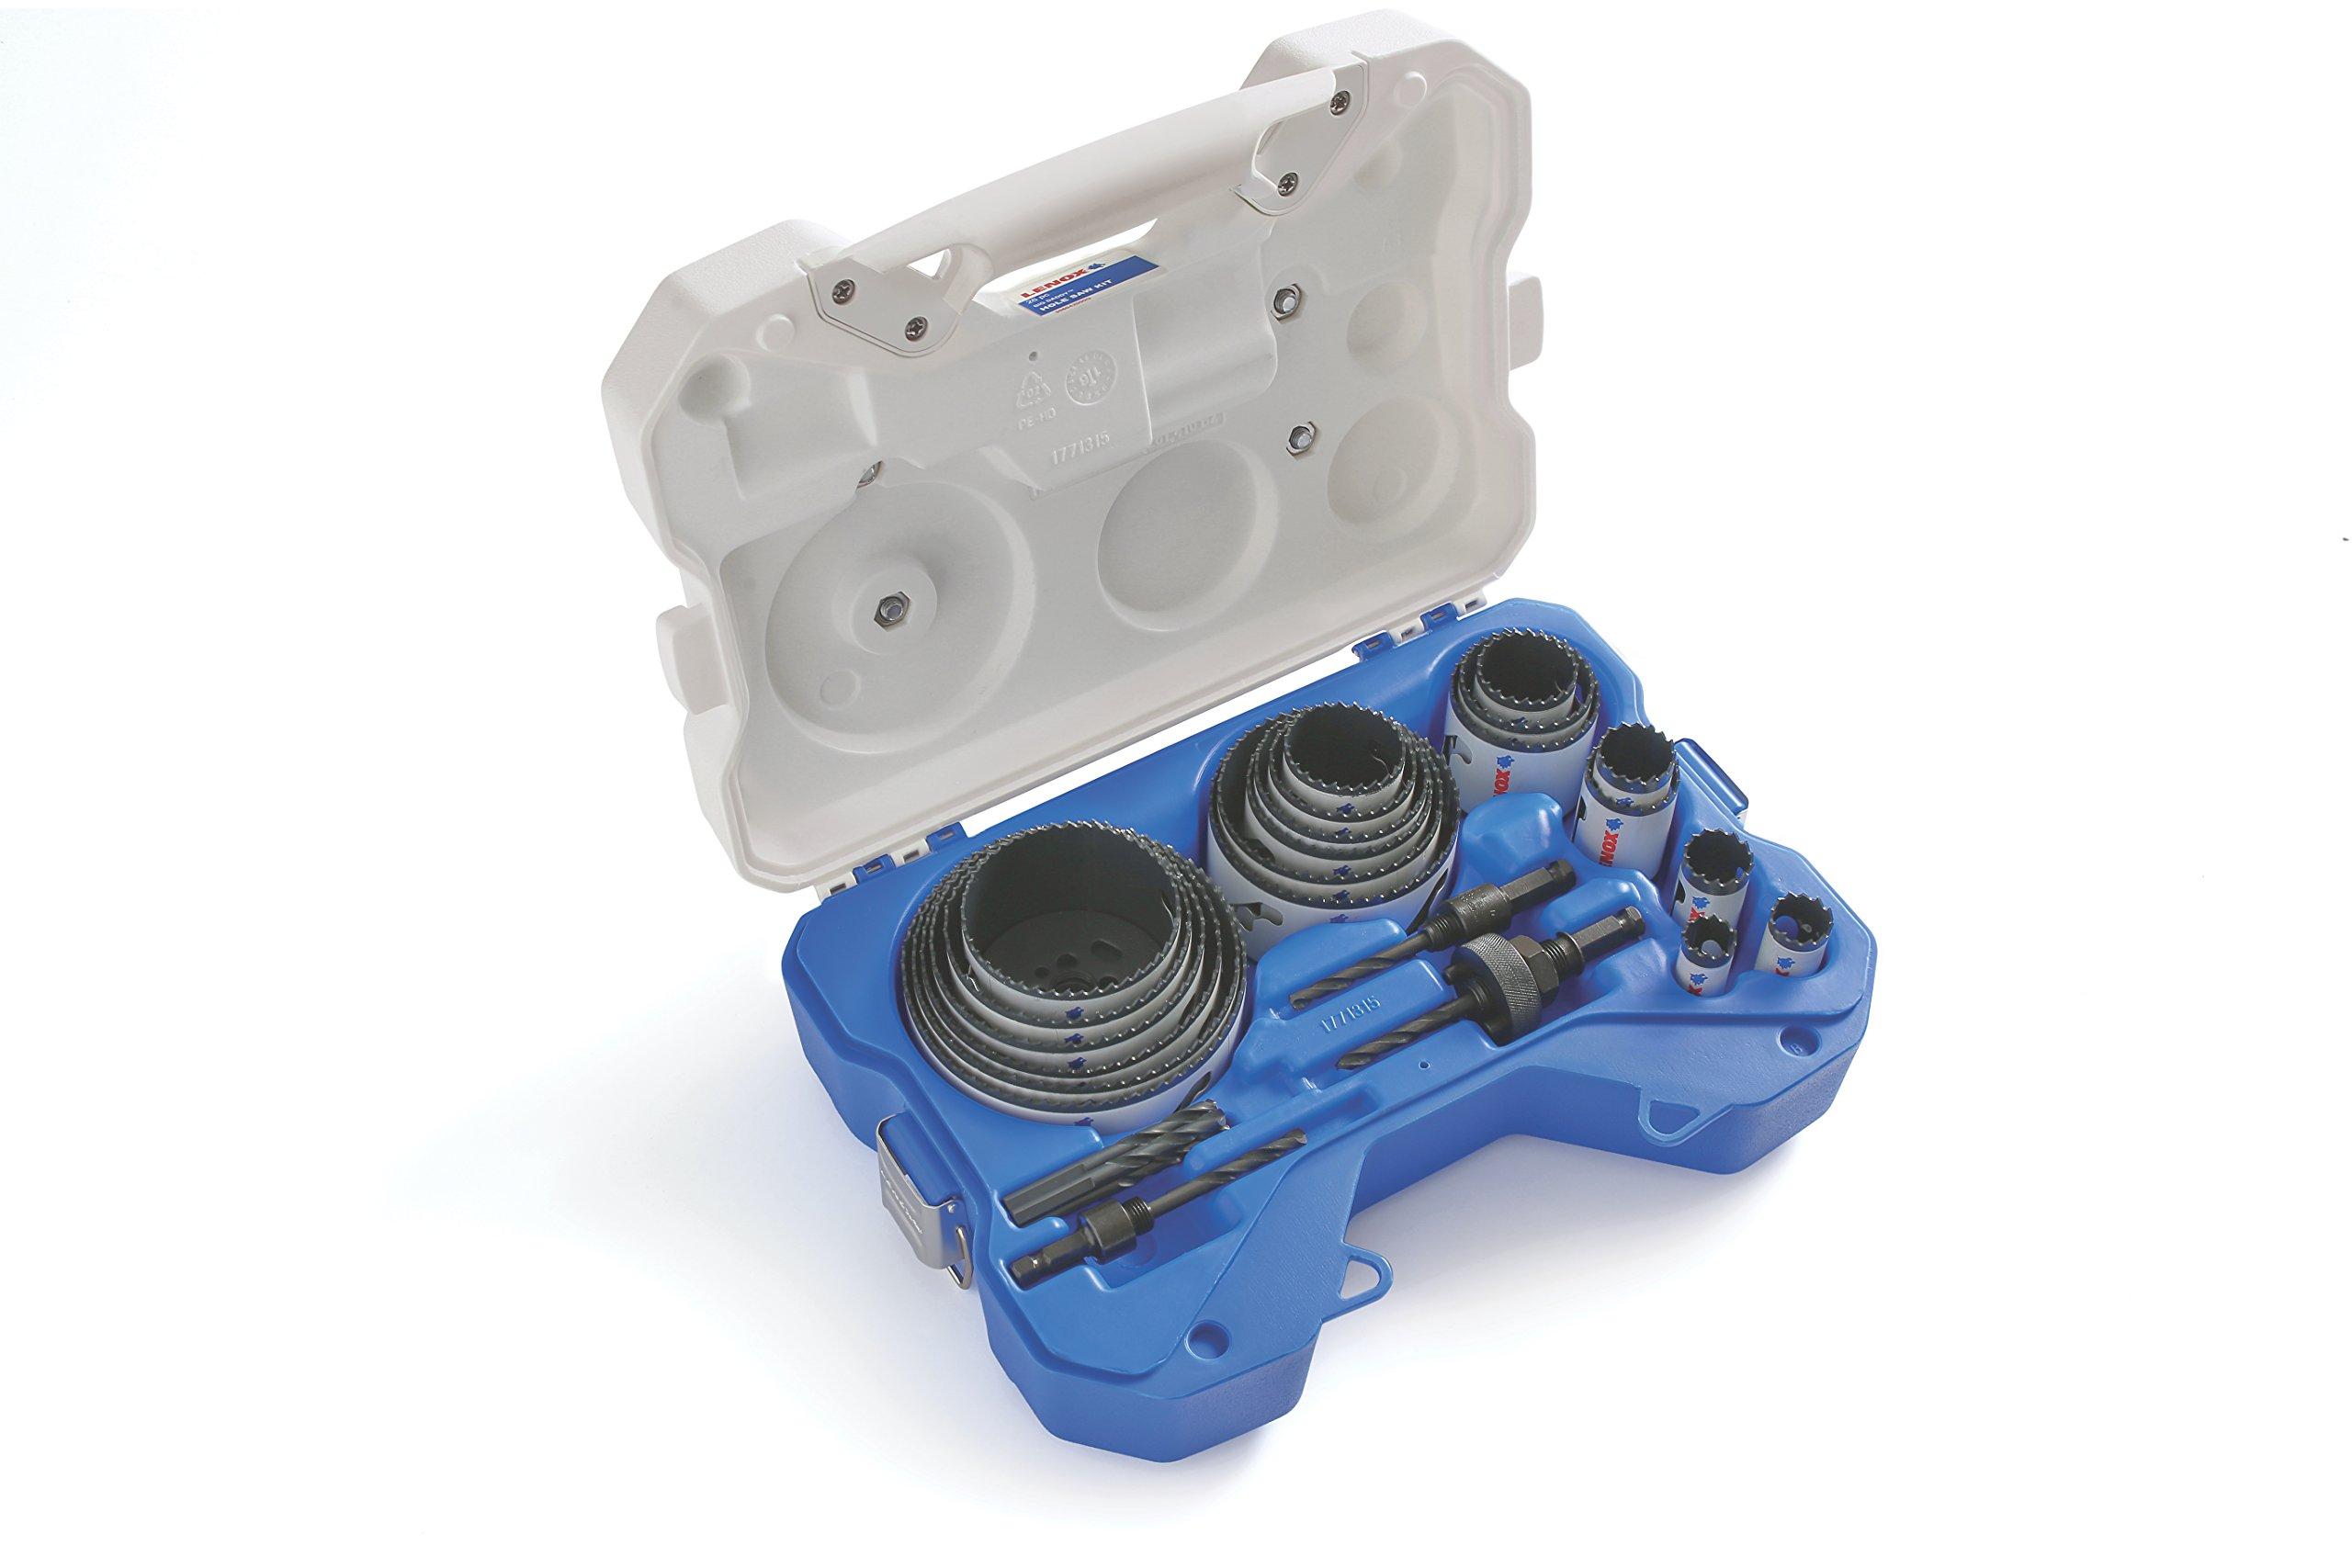 LENOX Tools Hole Saw Kit, Speed Slot, 26-Piece (308042000G) by Lenox Tools